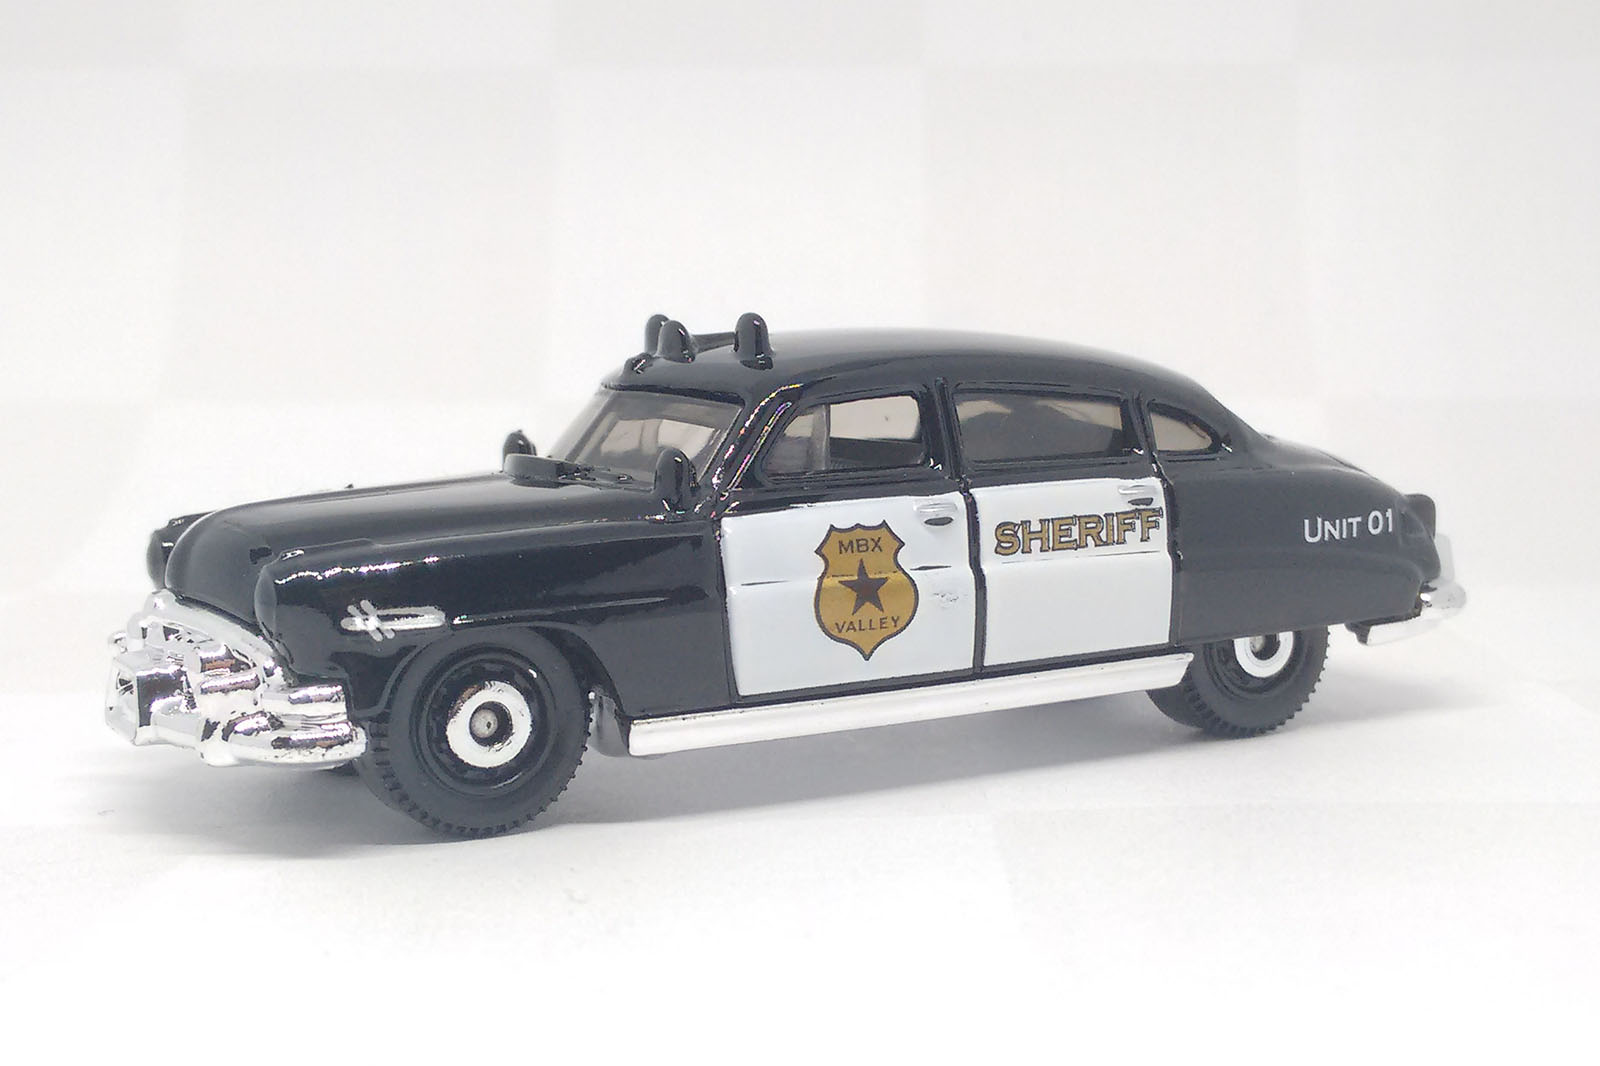 Matchbox Cars The Secrets Of Scaled Down Models Autocar 1951 Chevrolet Police Car Graham Heeps